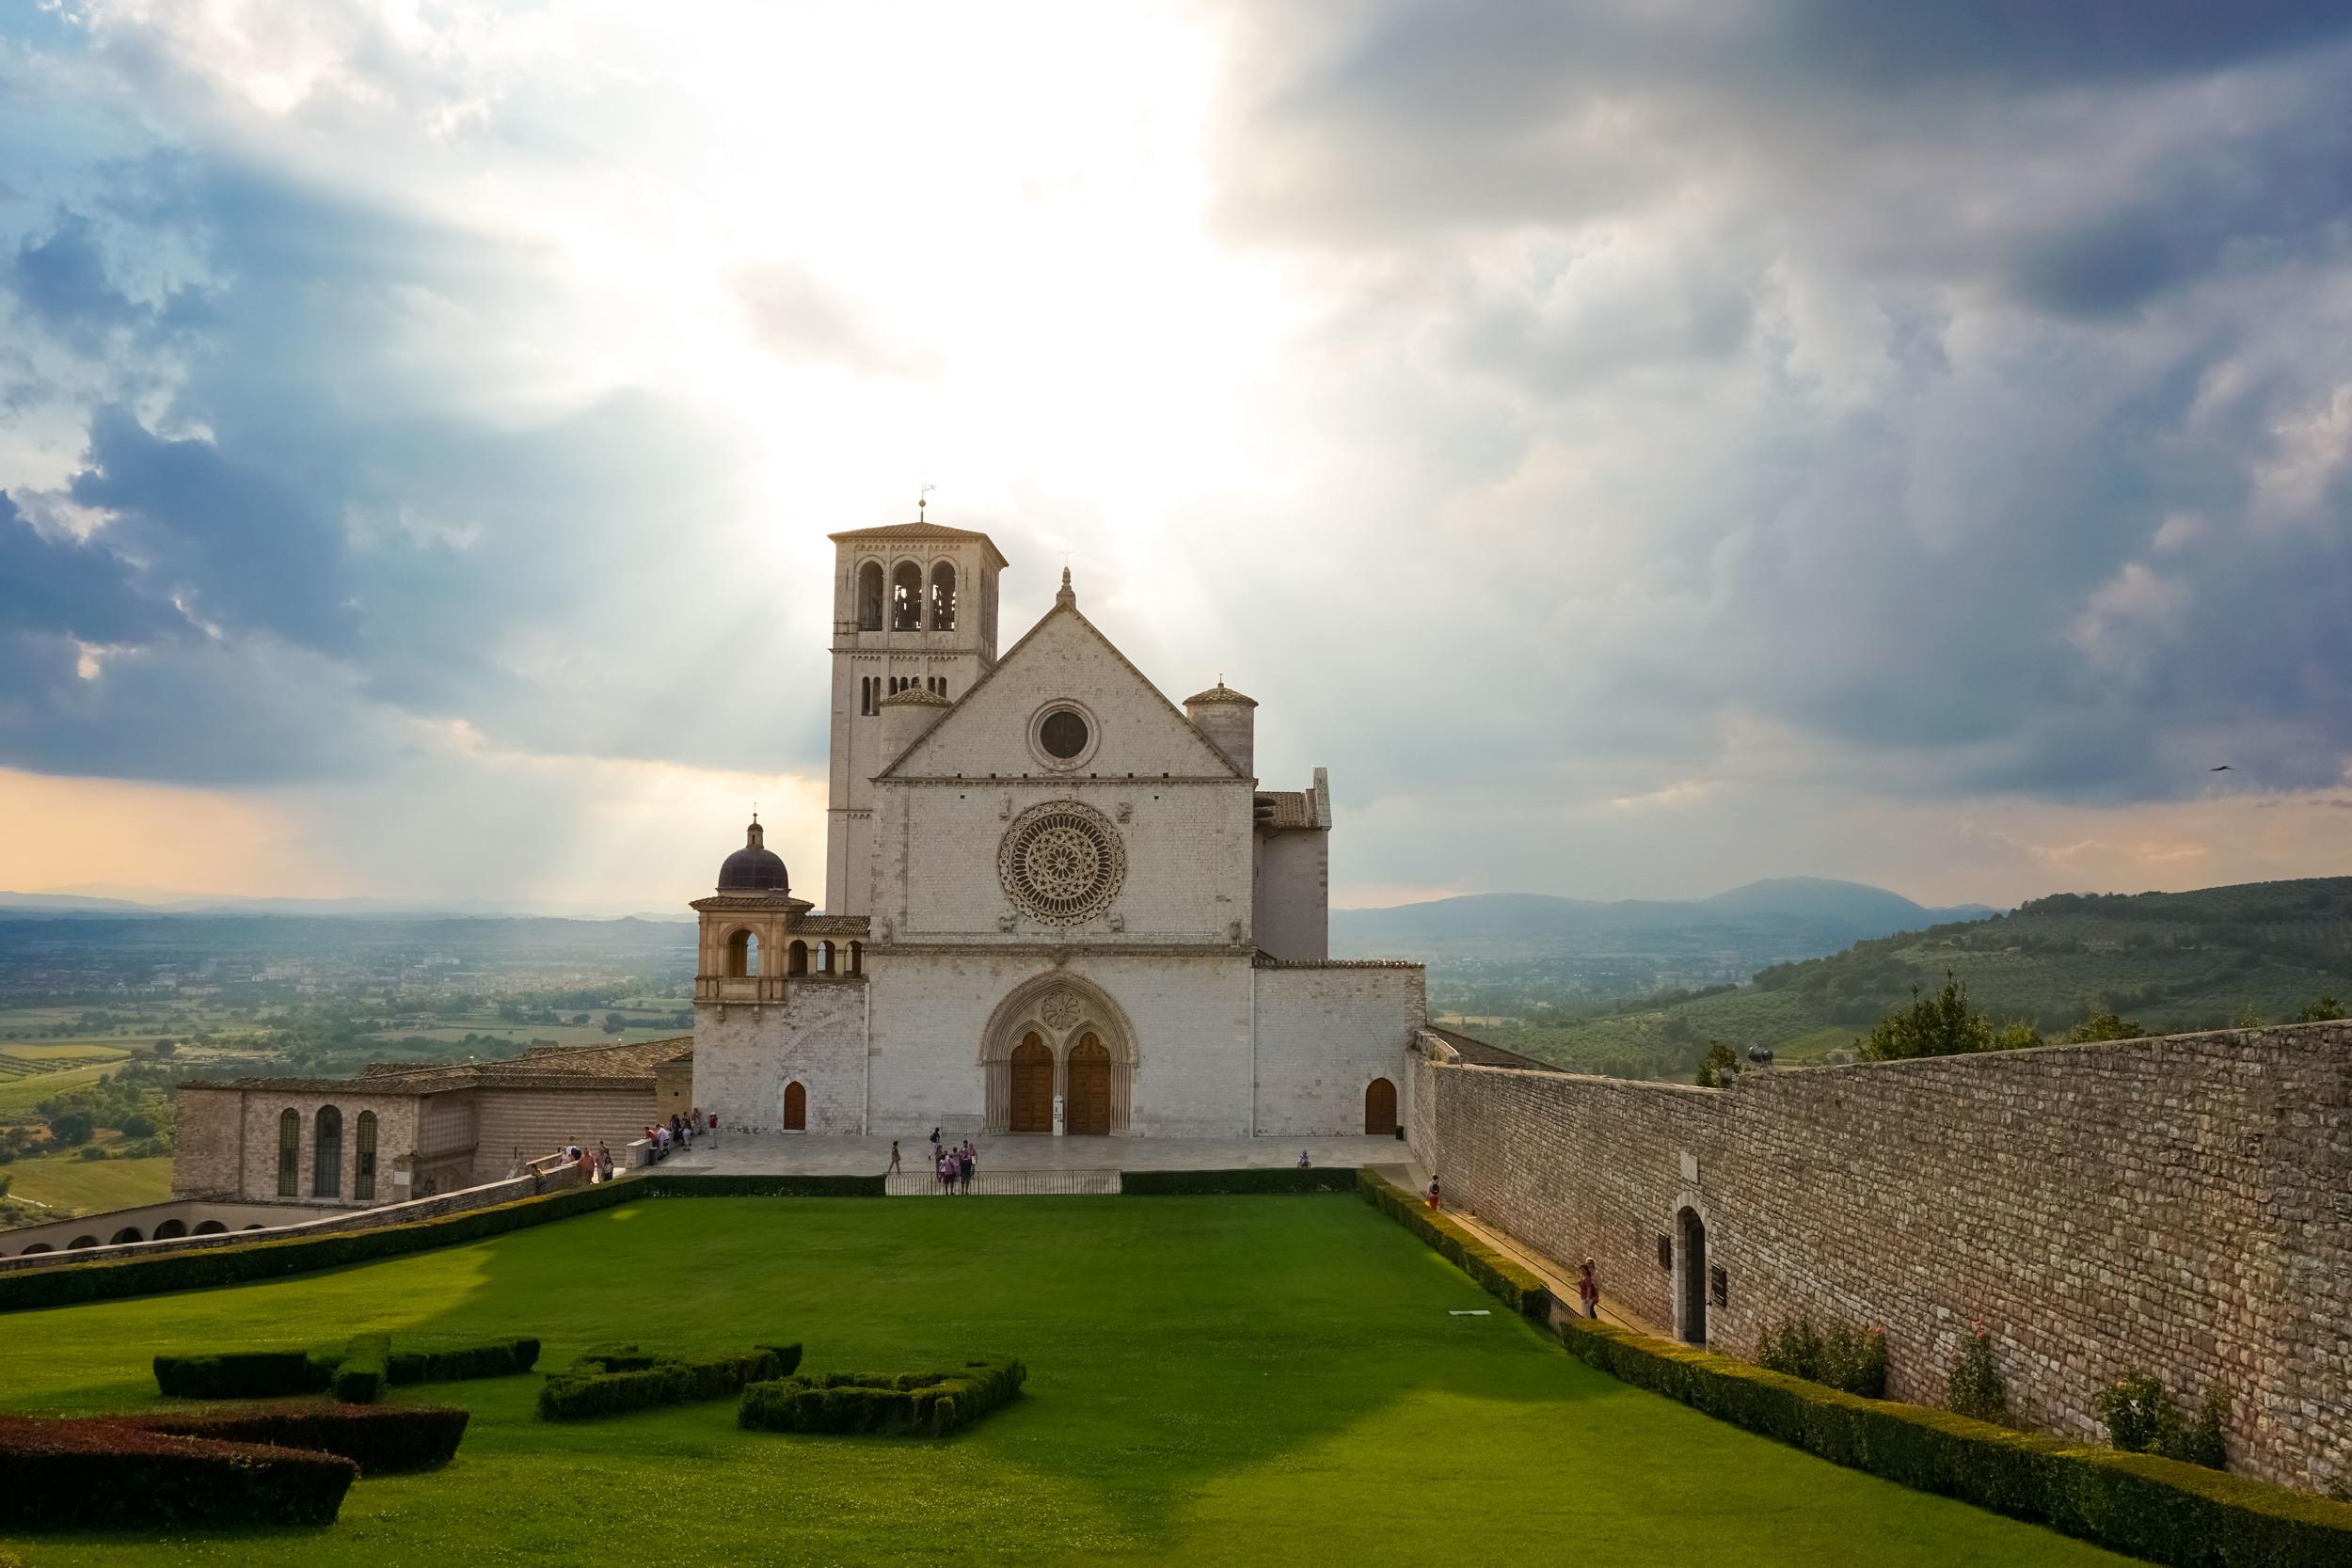 #assisi #umbria#italy #basilica